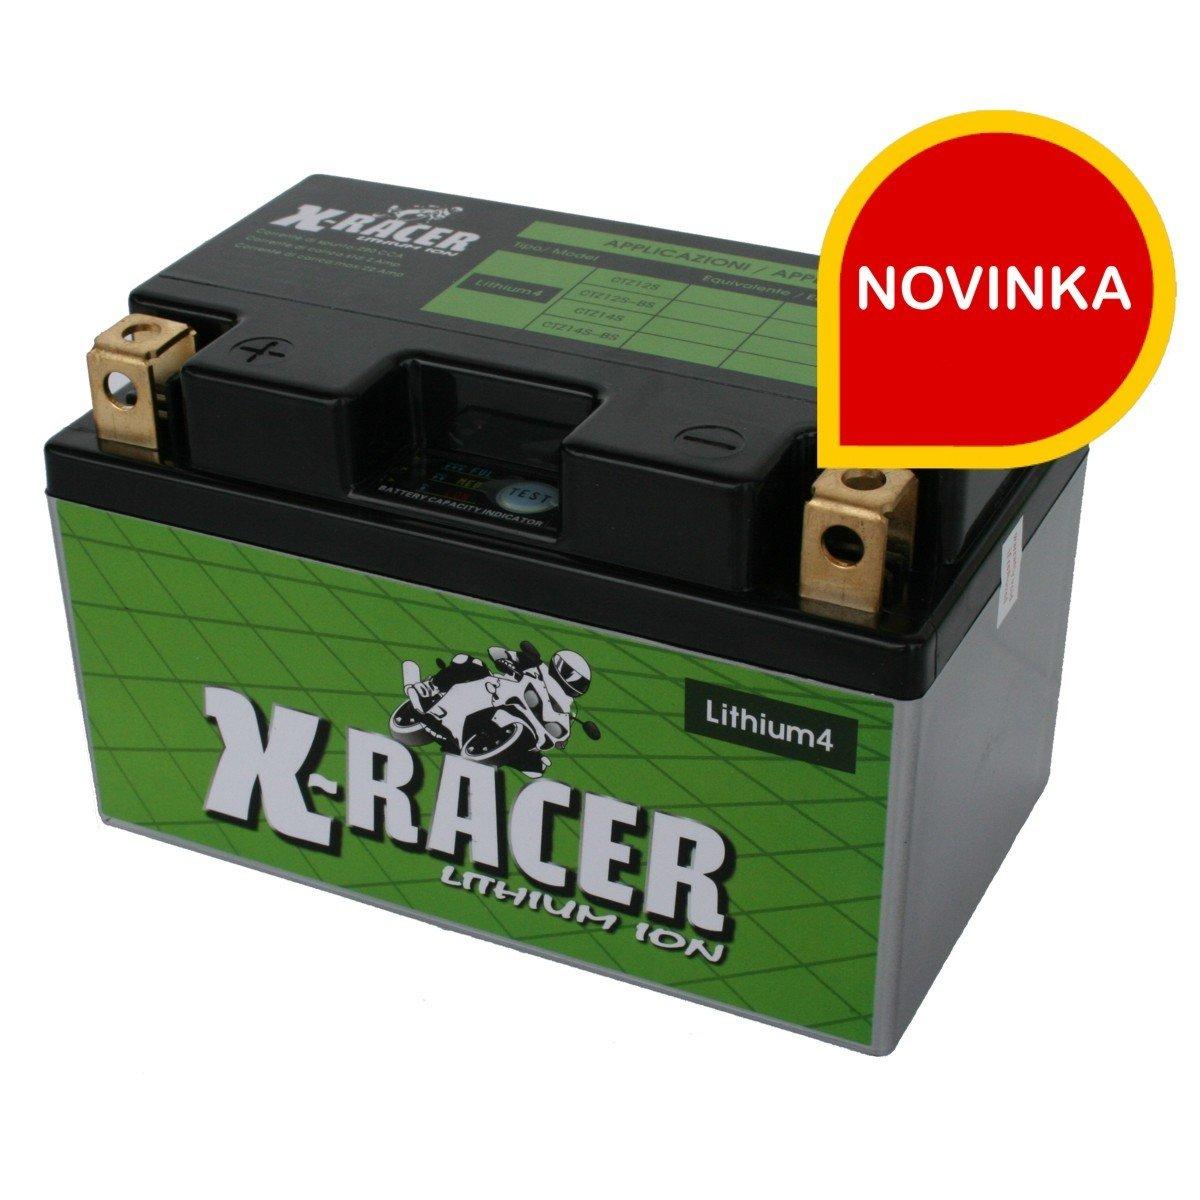 X-RACER Lithium4